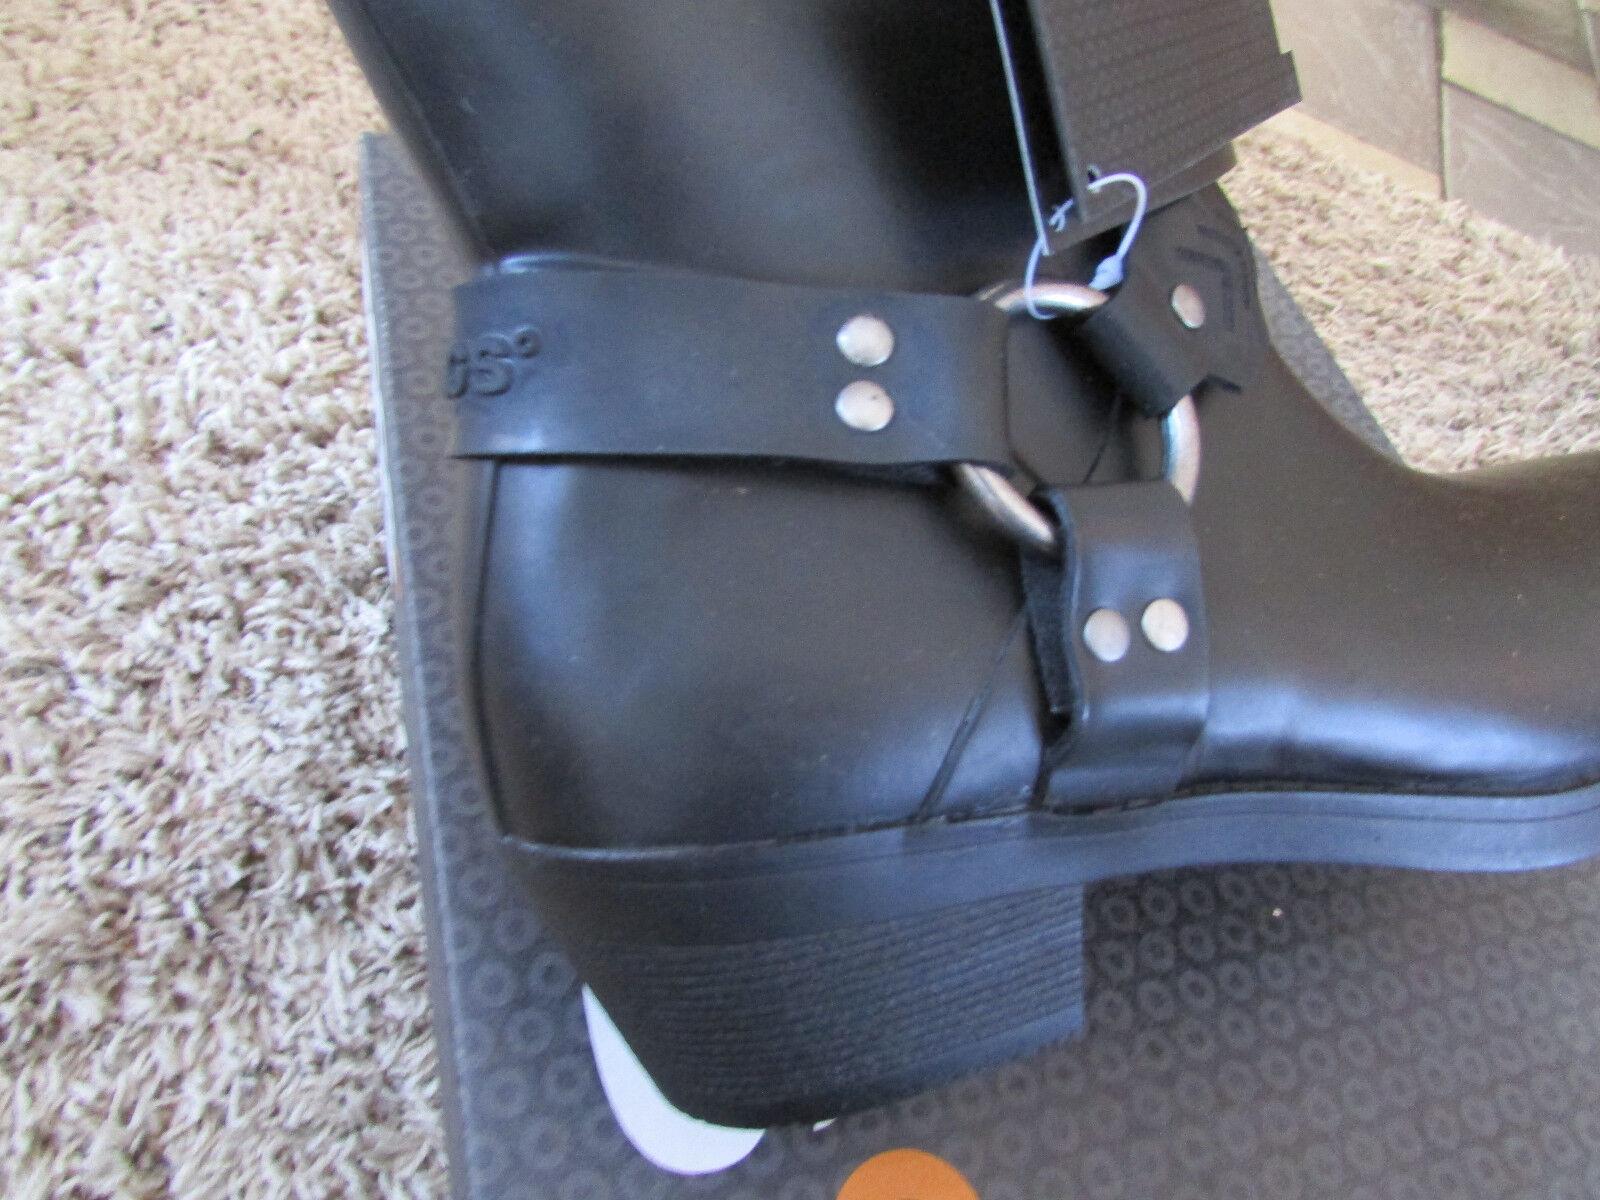 NEW BOGS SHORT WATERPROOF BLACK Stiefel Damenschuhe 7 DAKOTA SHORT BOGS 522371 BLACK WATERPROOF 8d0e27